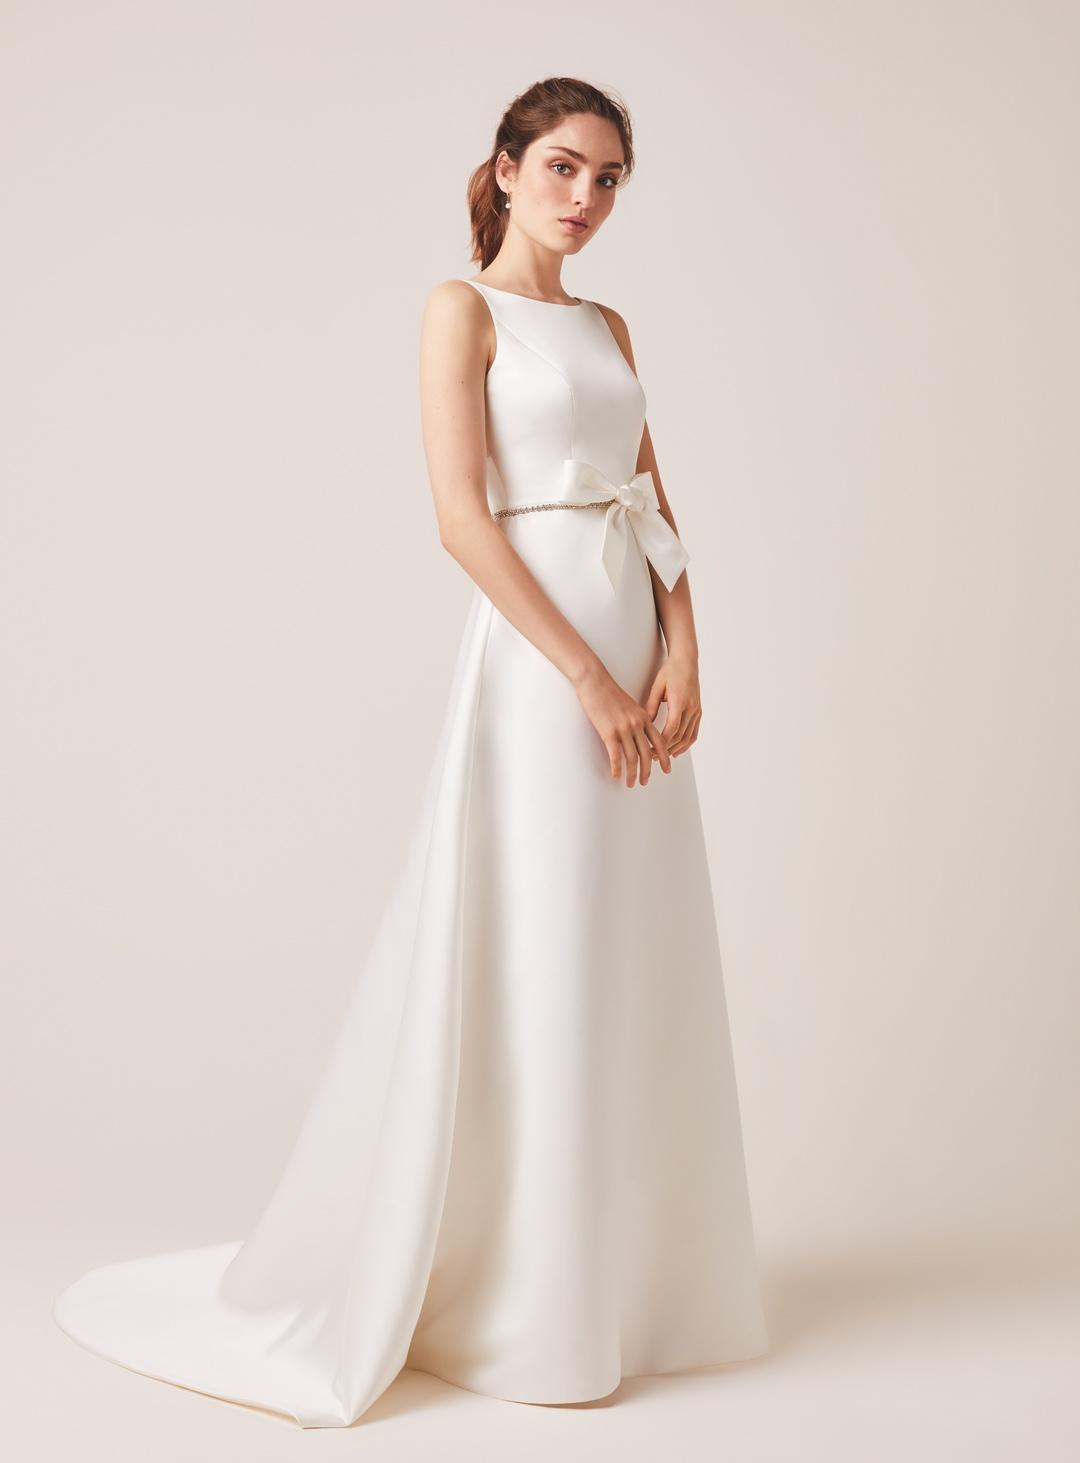 126 dress photo